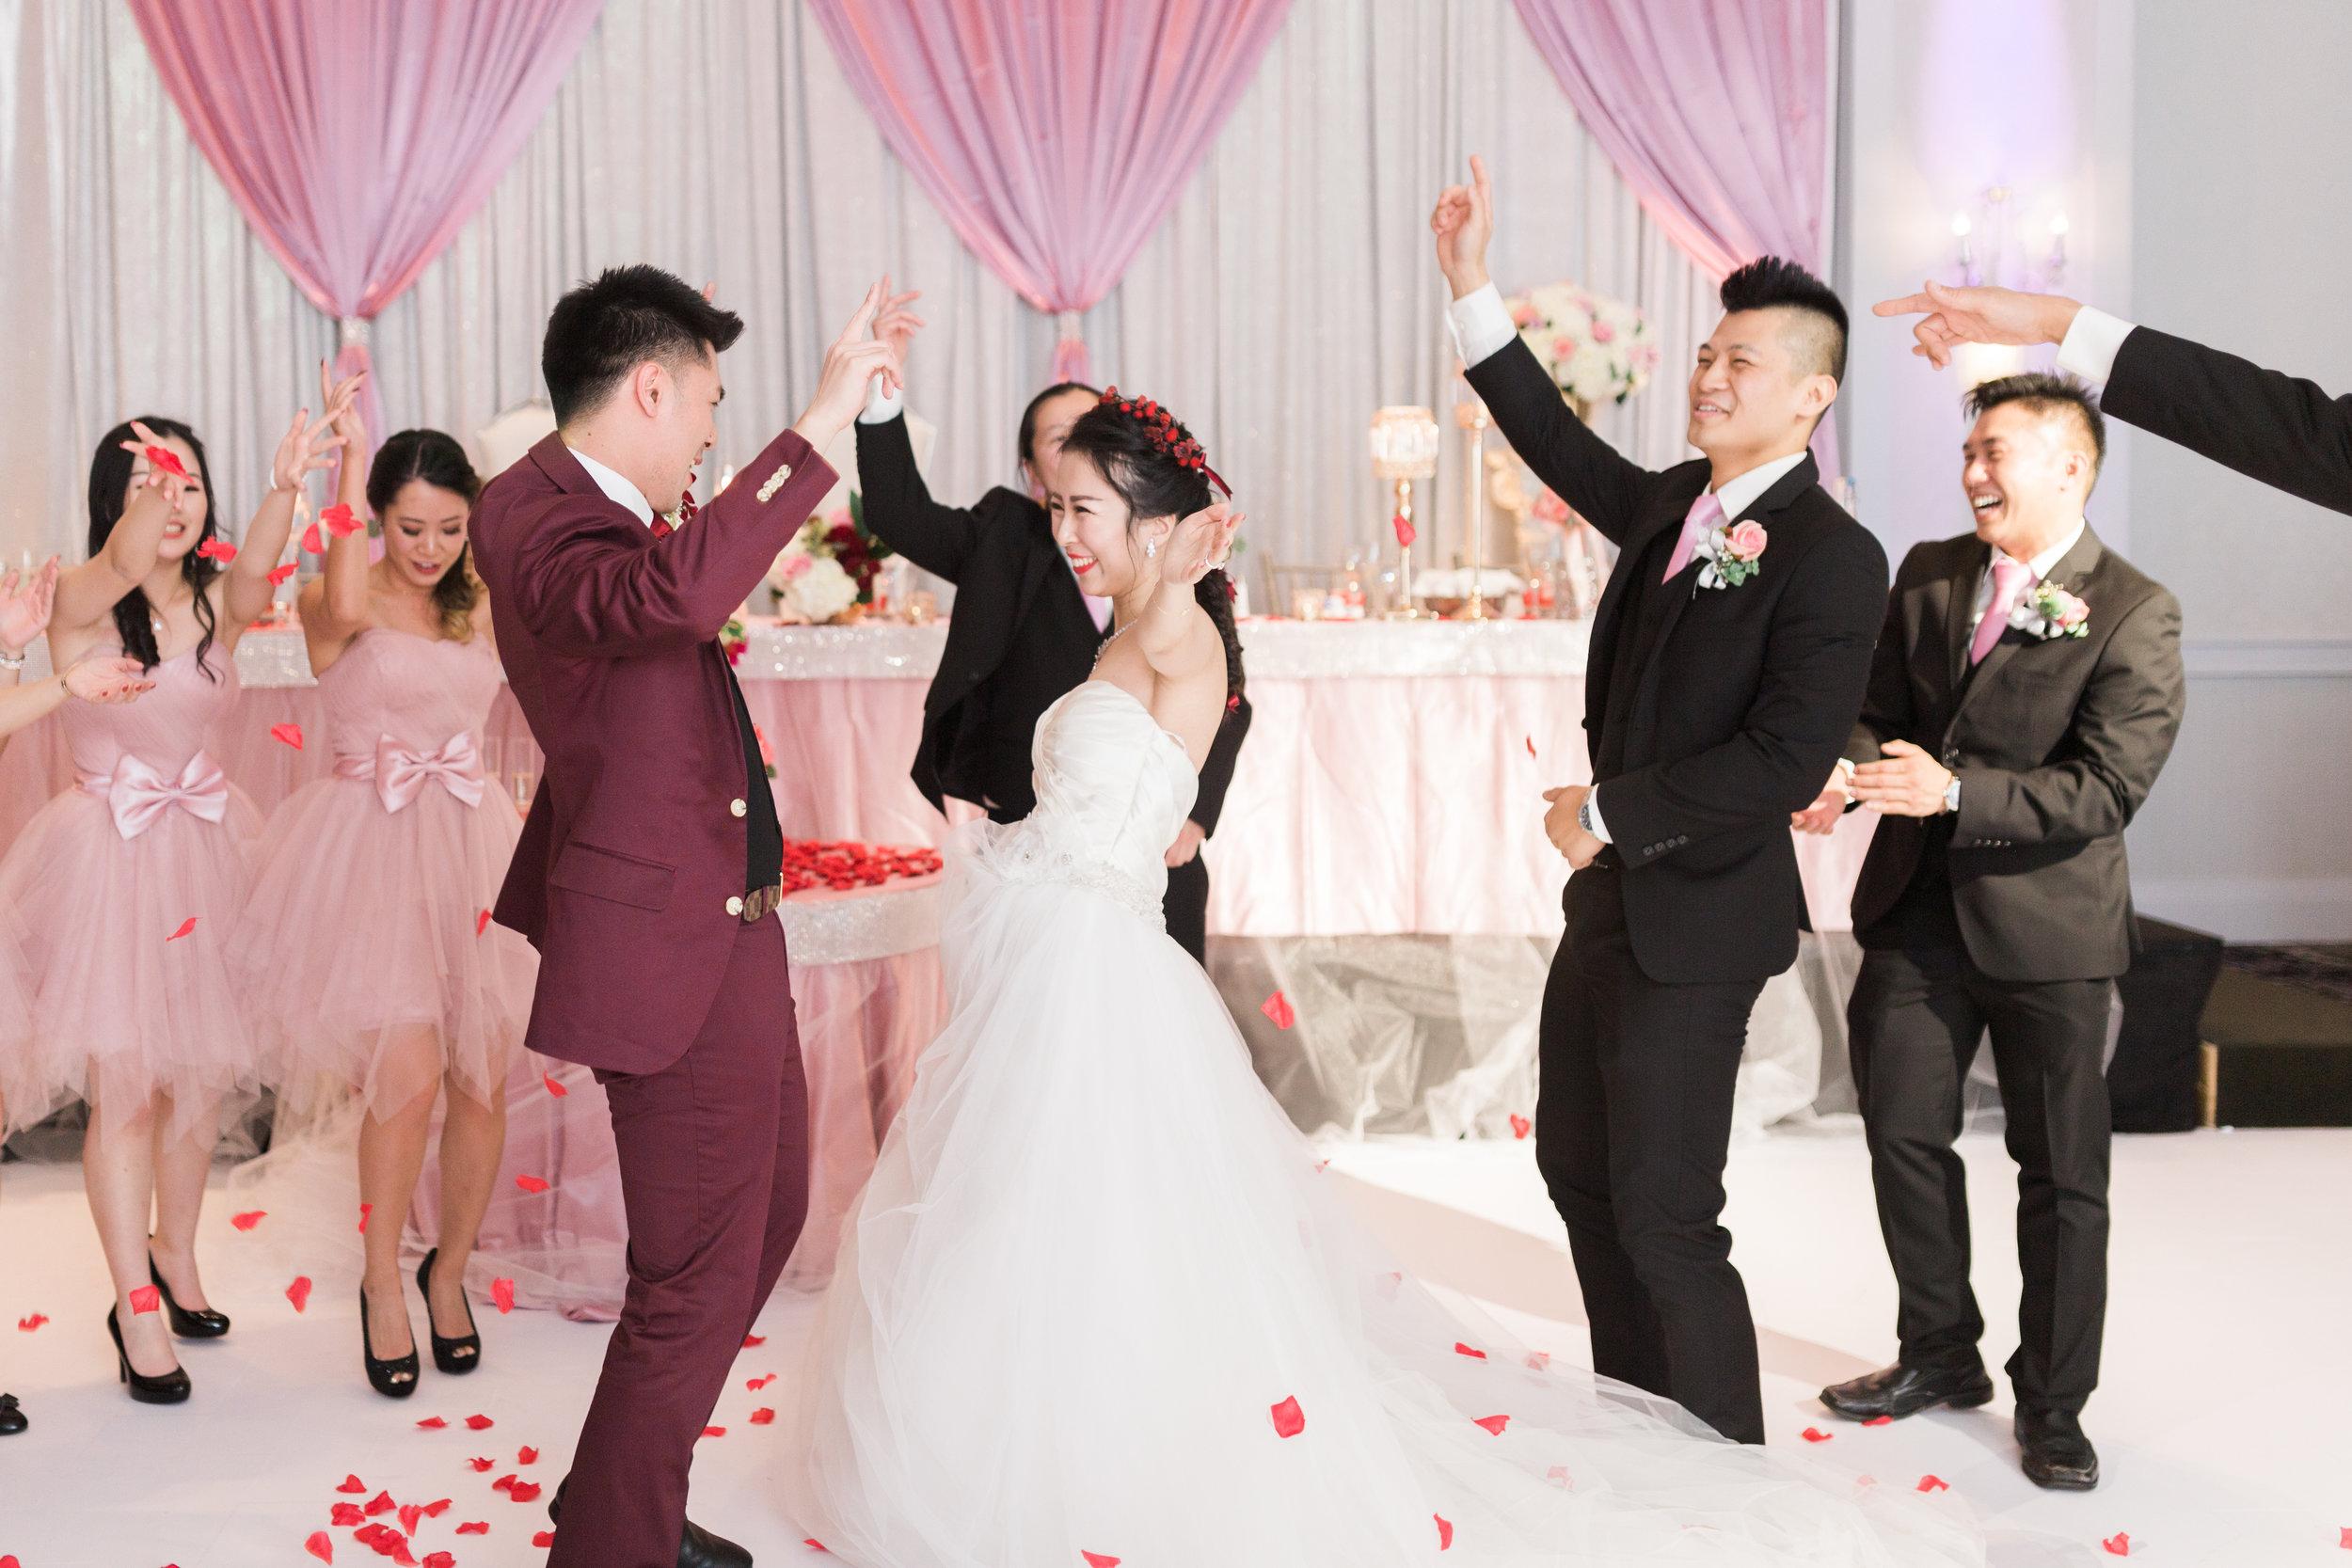 Parkview Manor Wedding - Reception-48.jpg